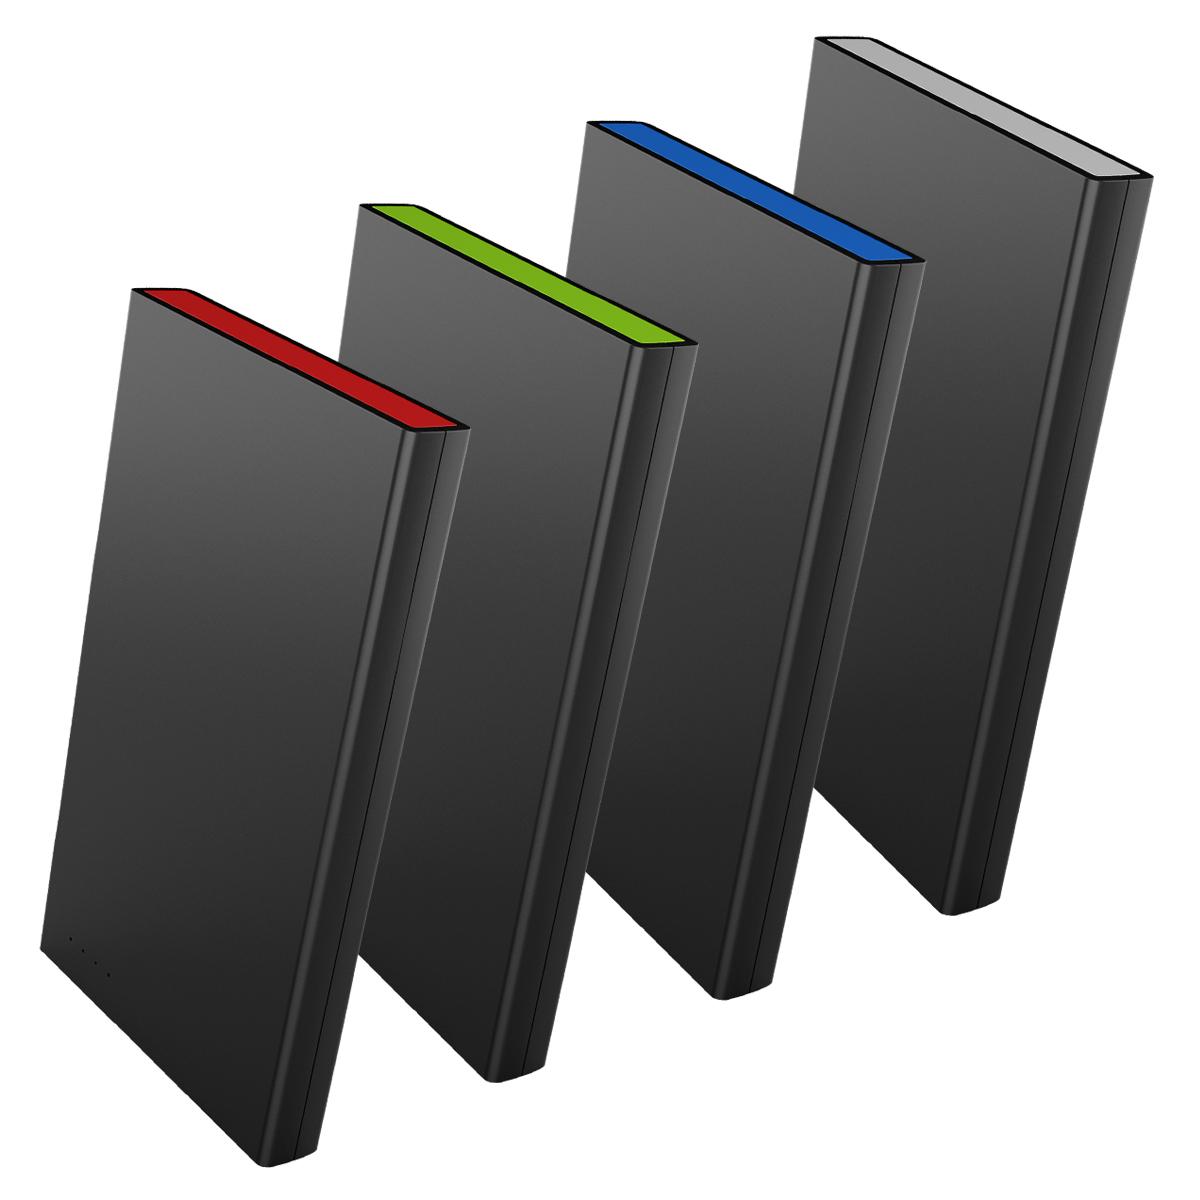 Portable Power Bank Mini Slim Power Bank on sale